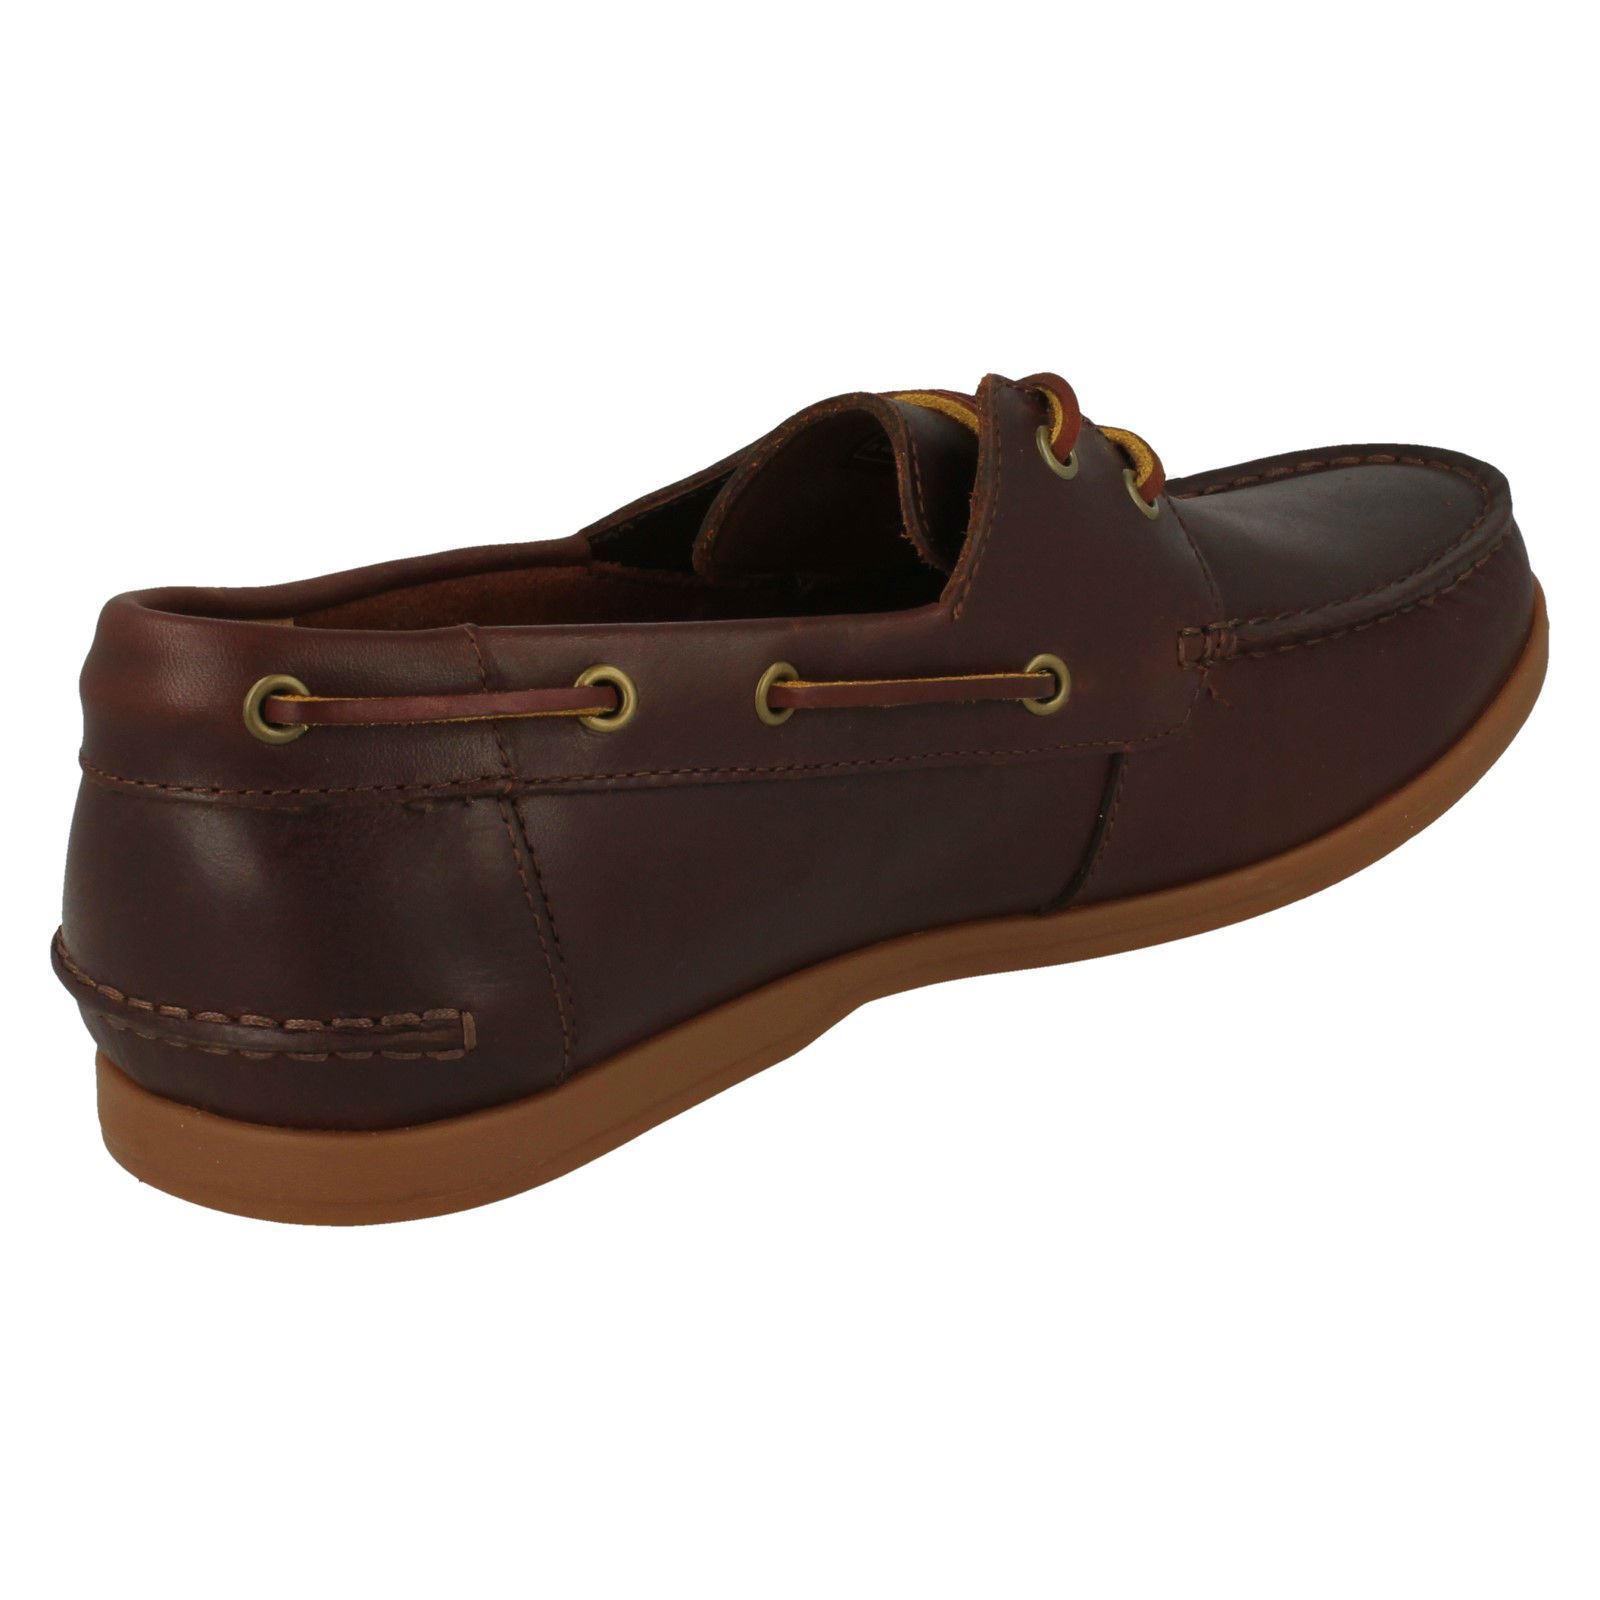 'Mens Clarks' Lace Up Boat Shoes - Morven Sail